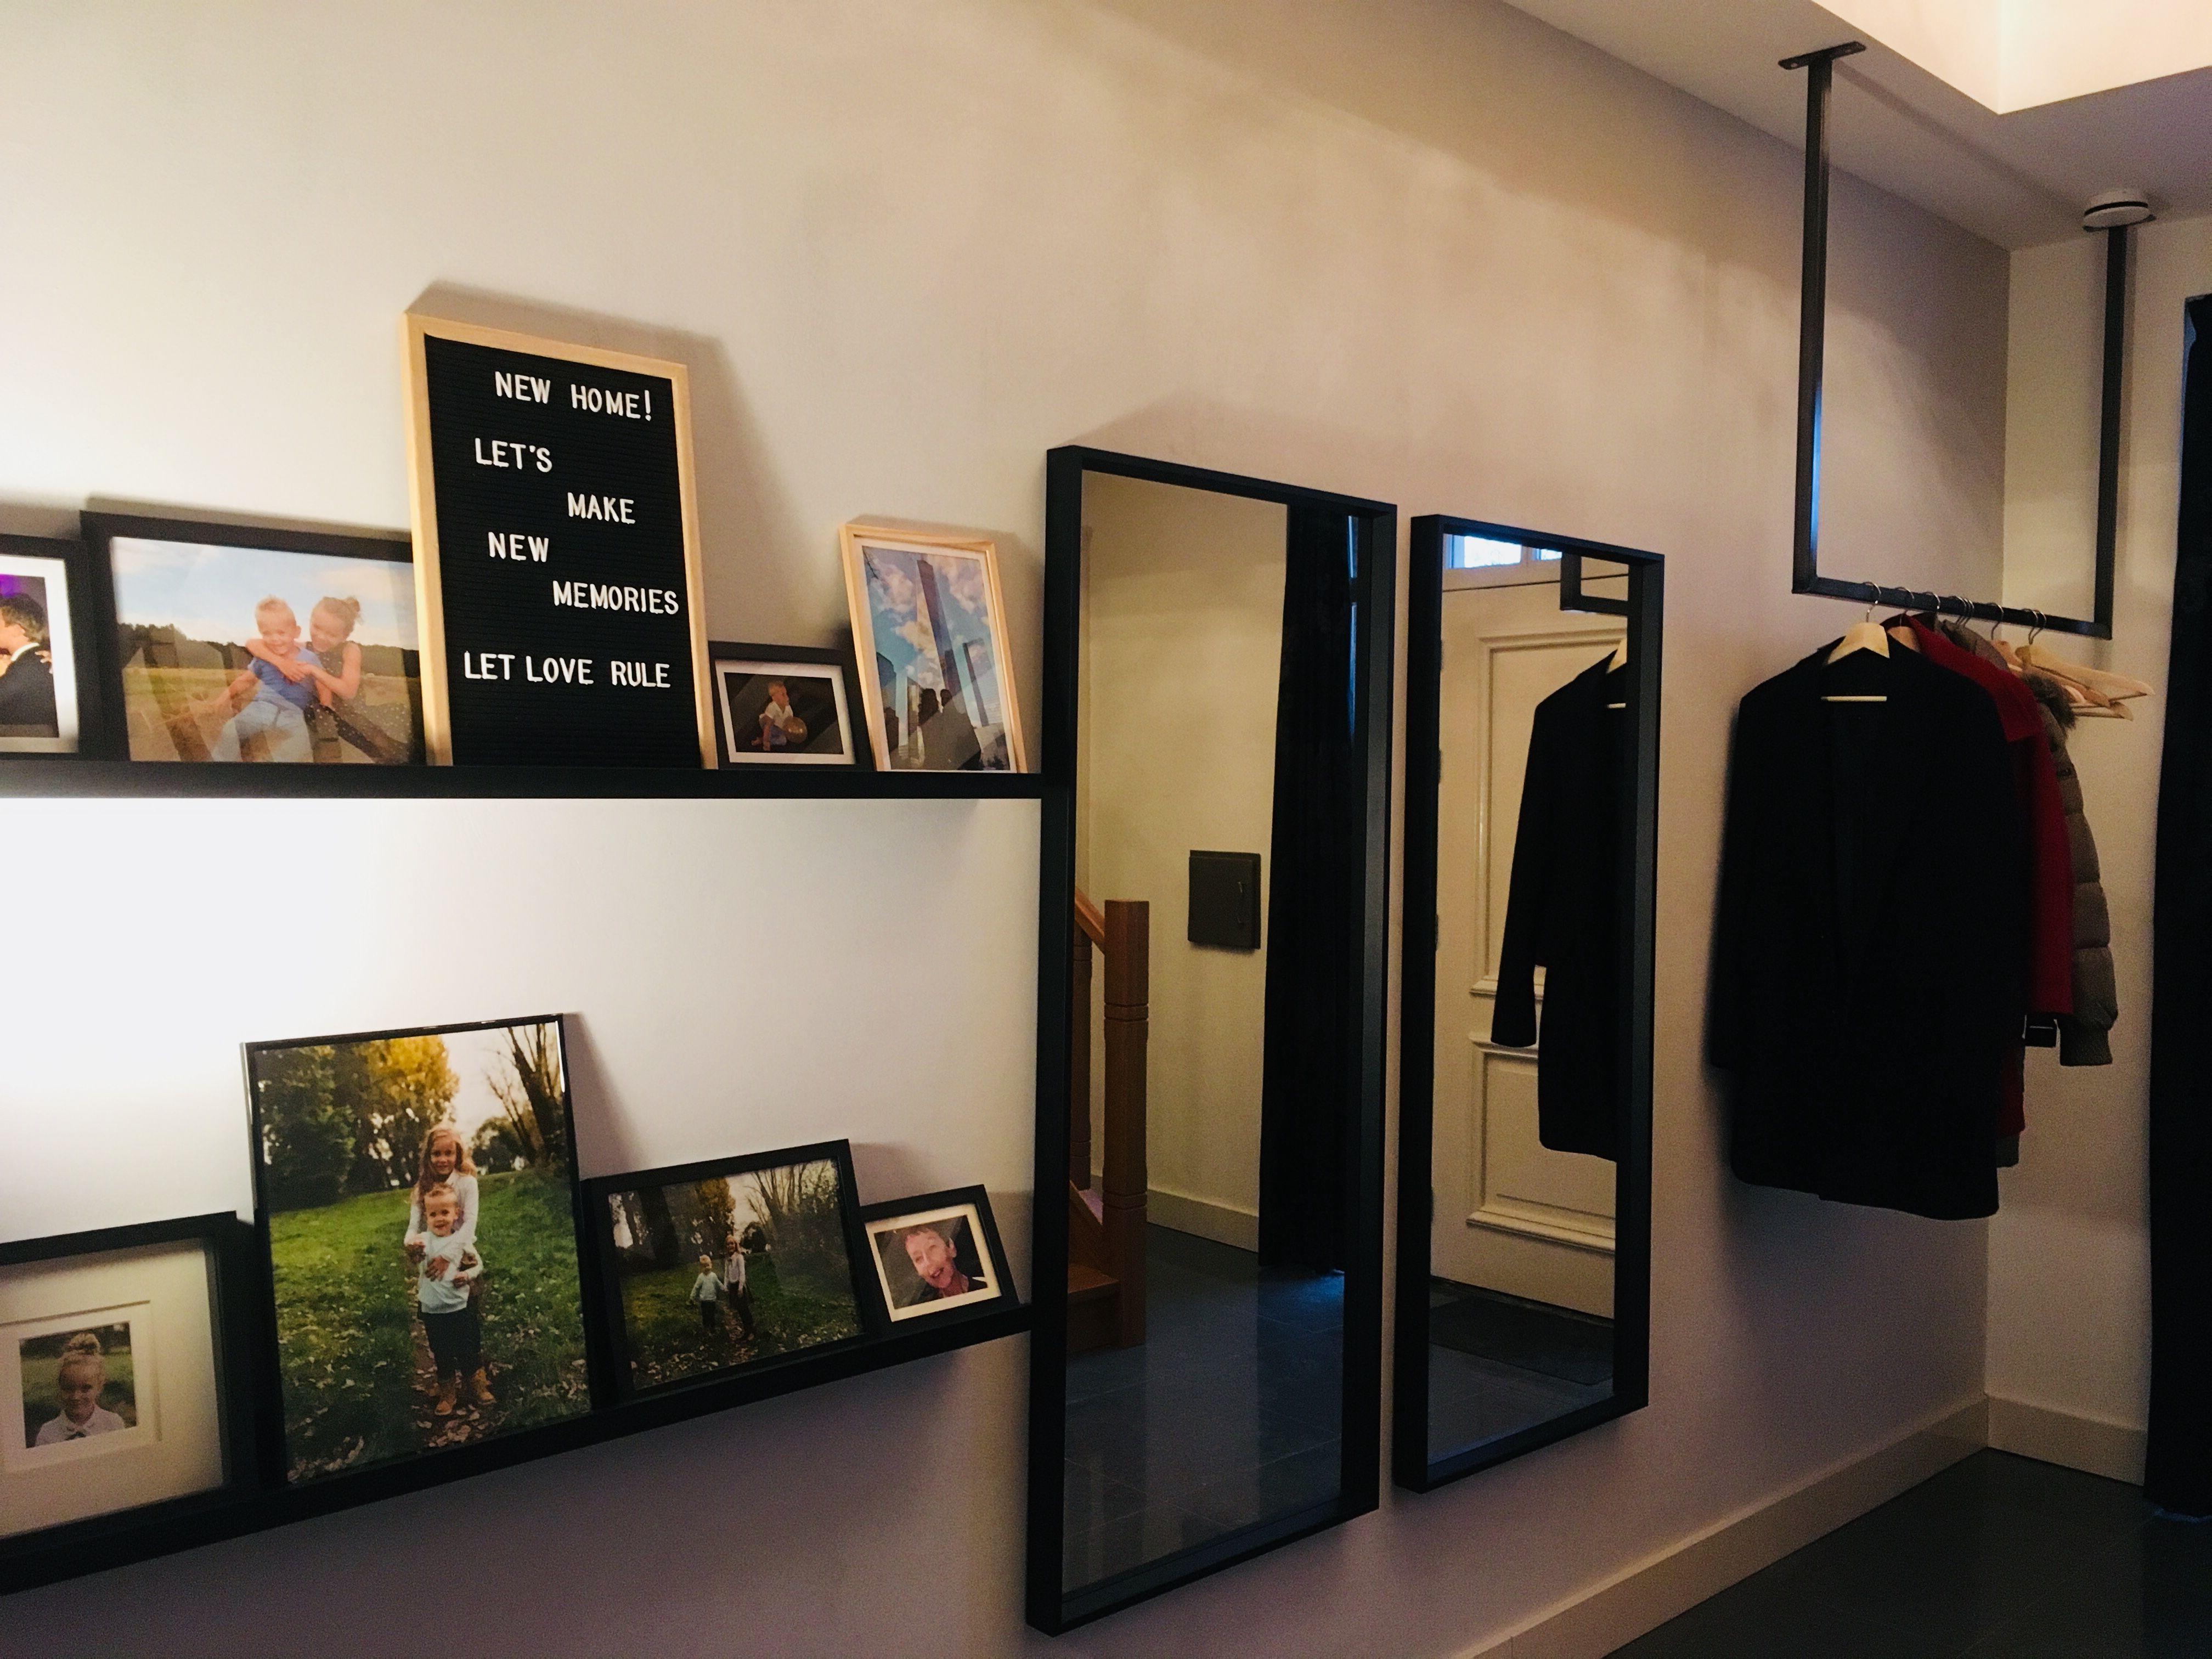 Grote Spiegel Industrieel : Moderne hal industrieel foto muur grote spiegels hangende